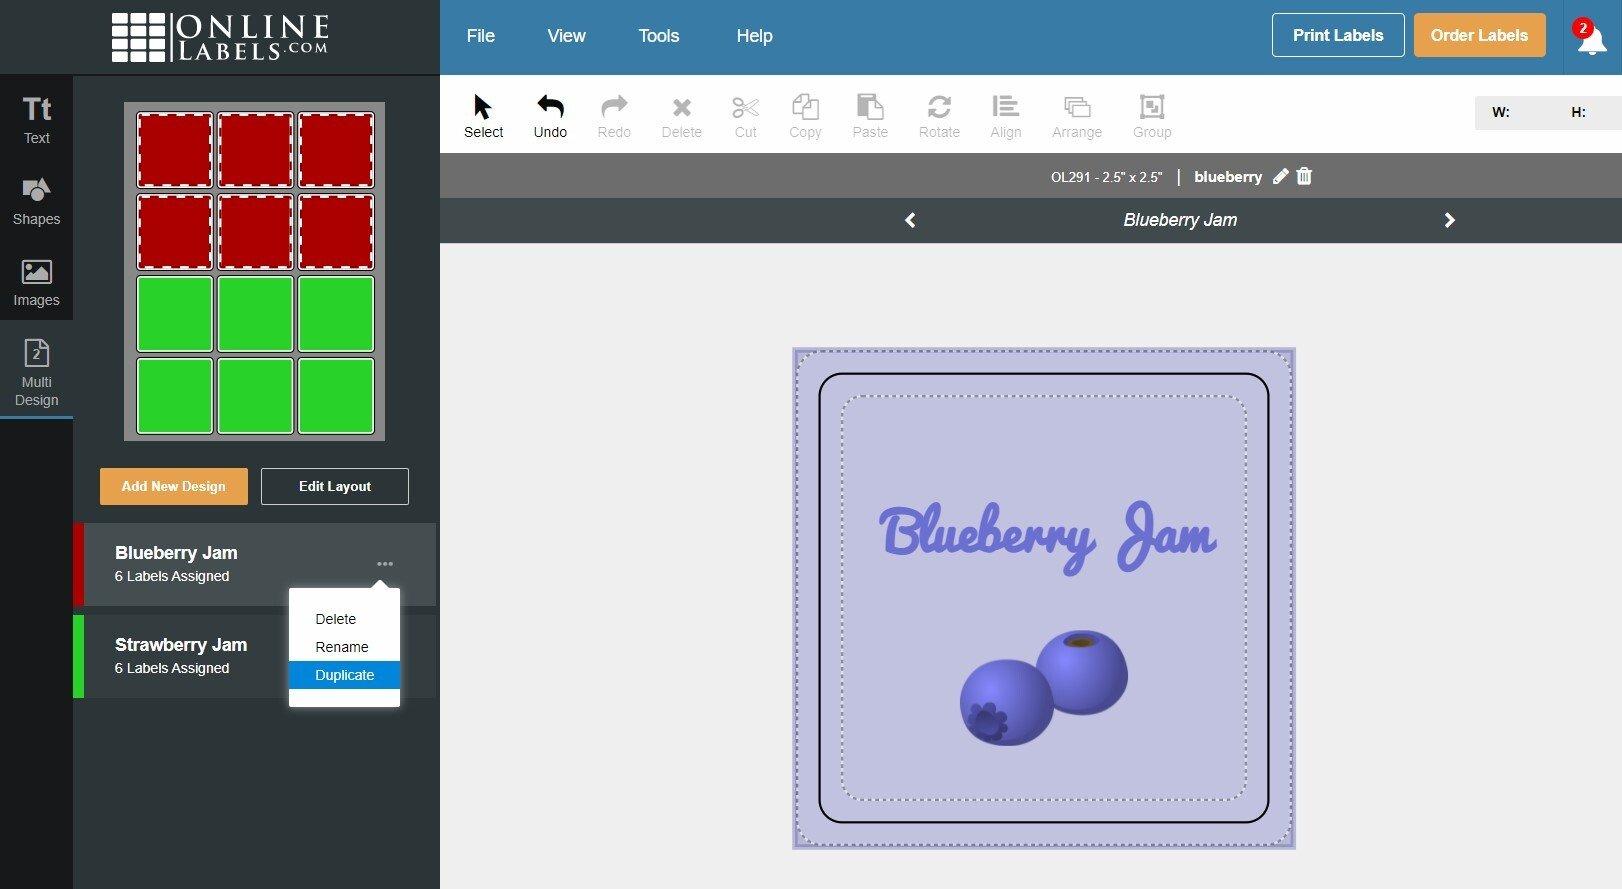 Duplicate design button